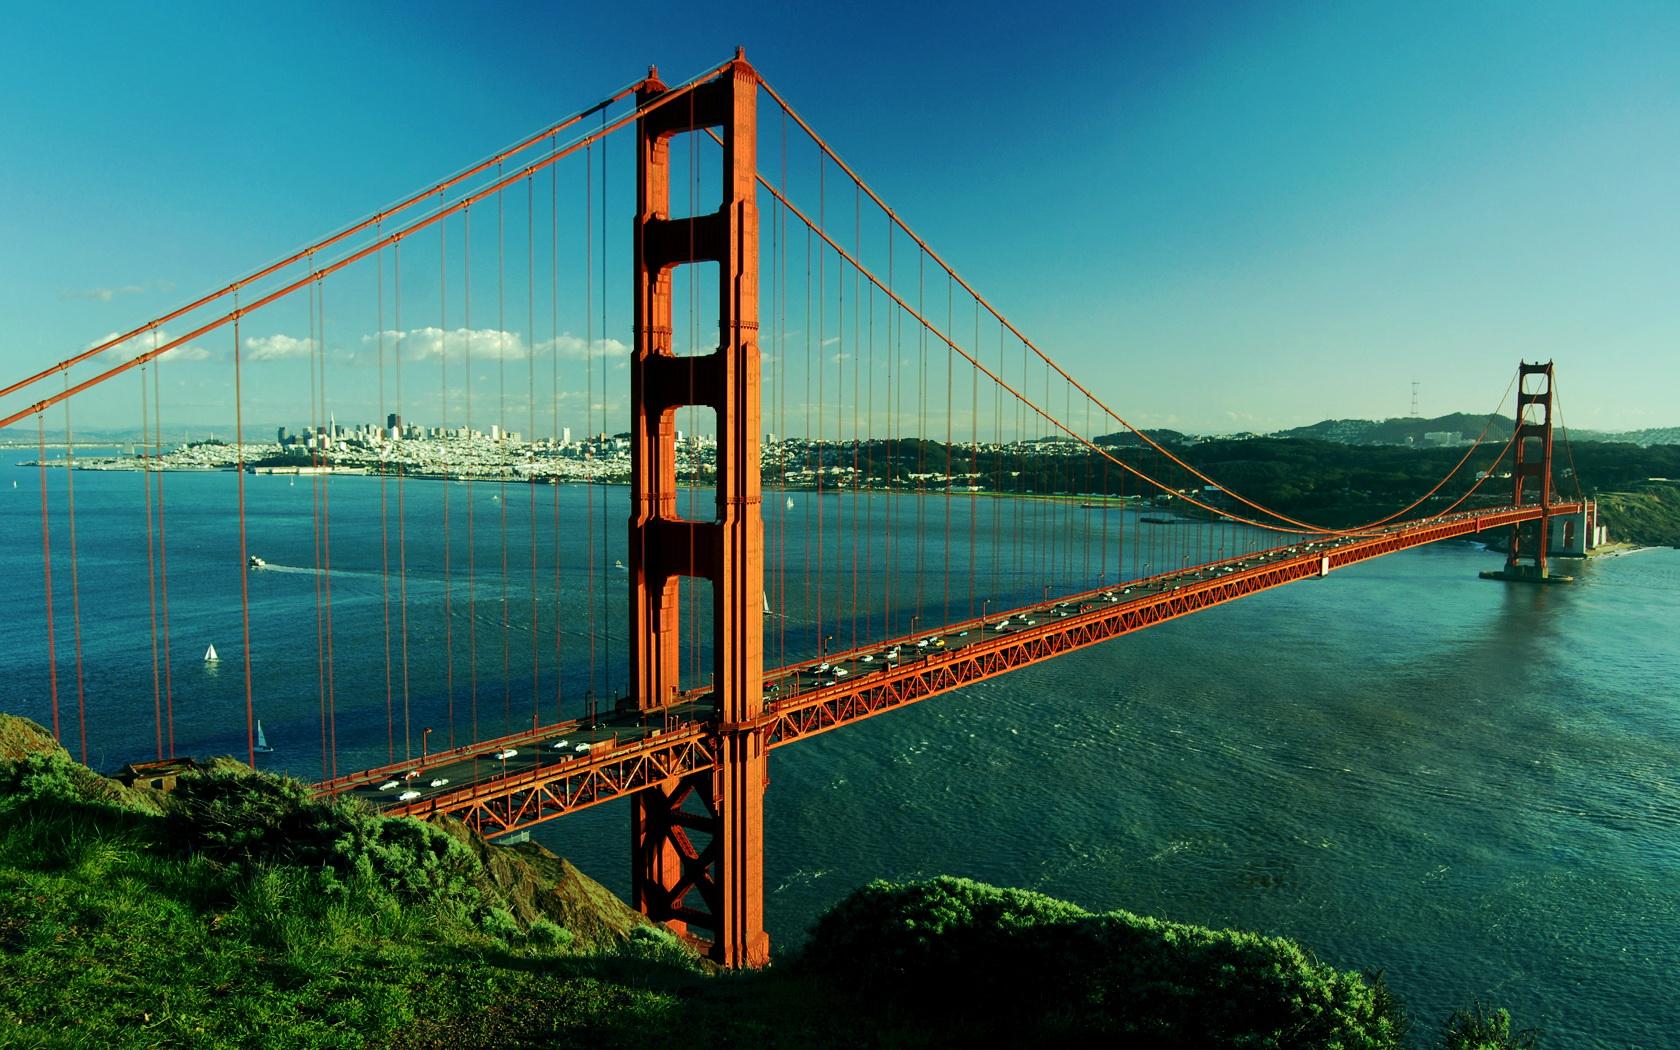 Golden Gate San Francisco Wallpaper 1680x1050 21476